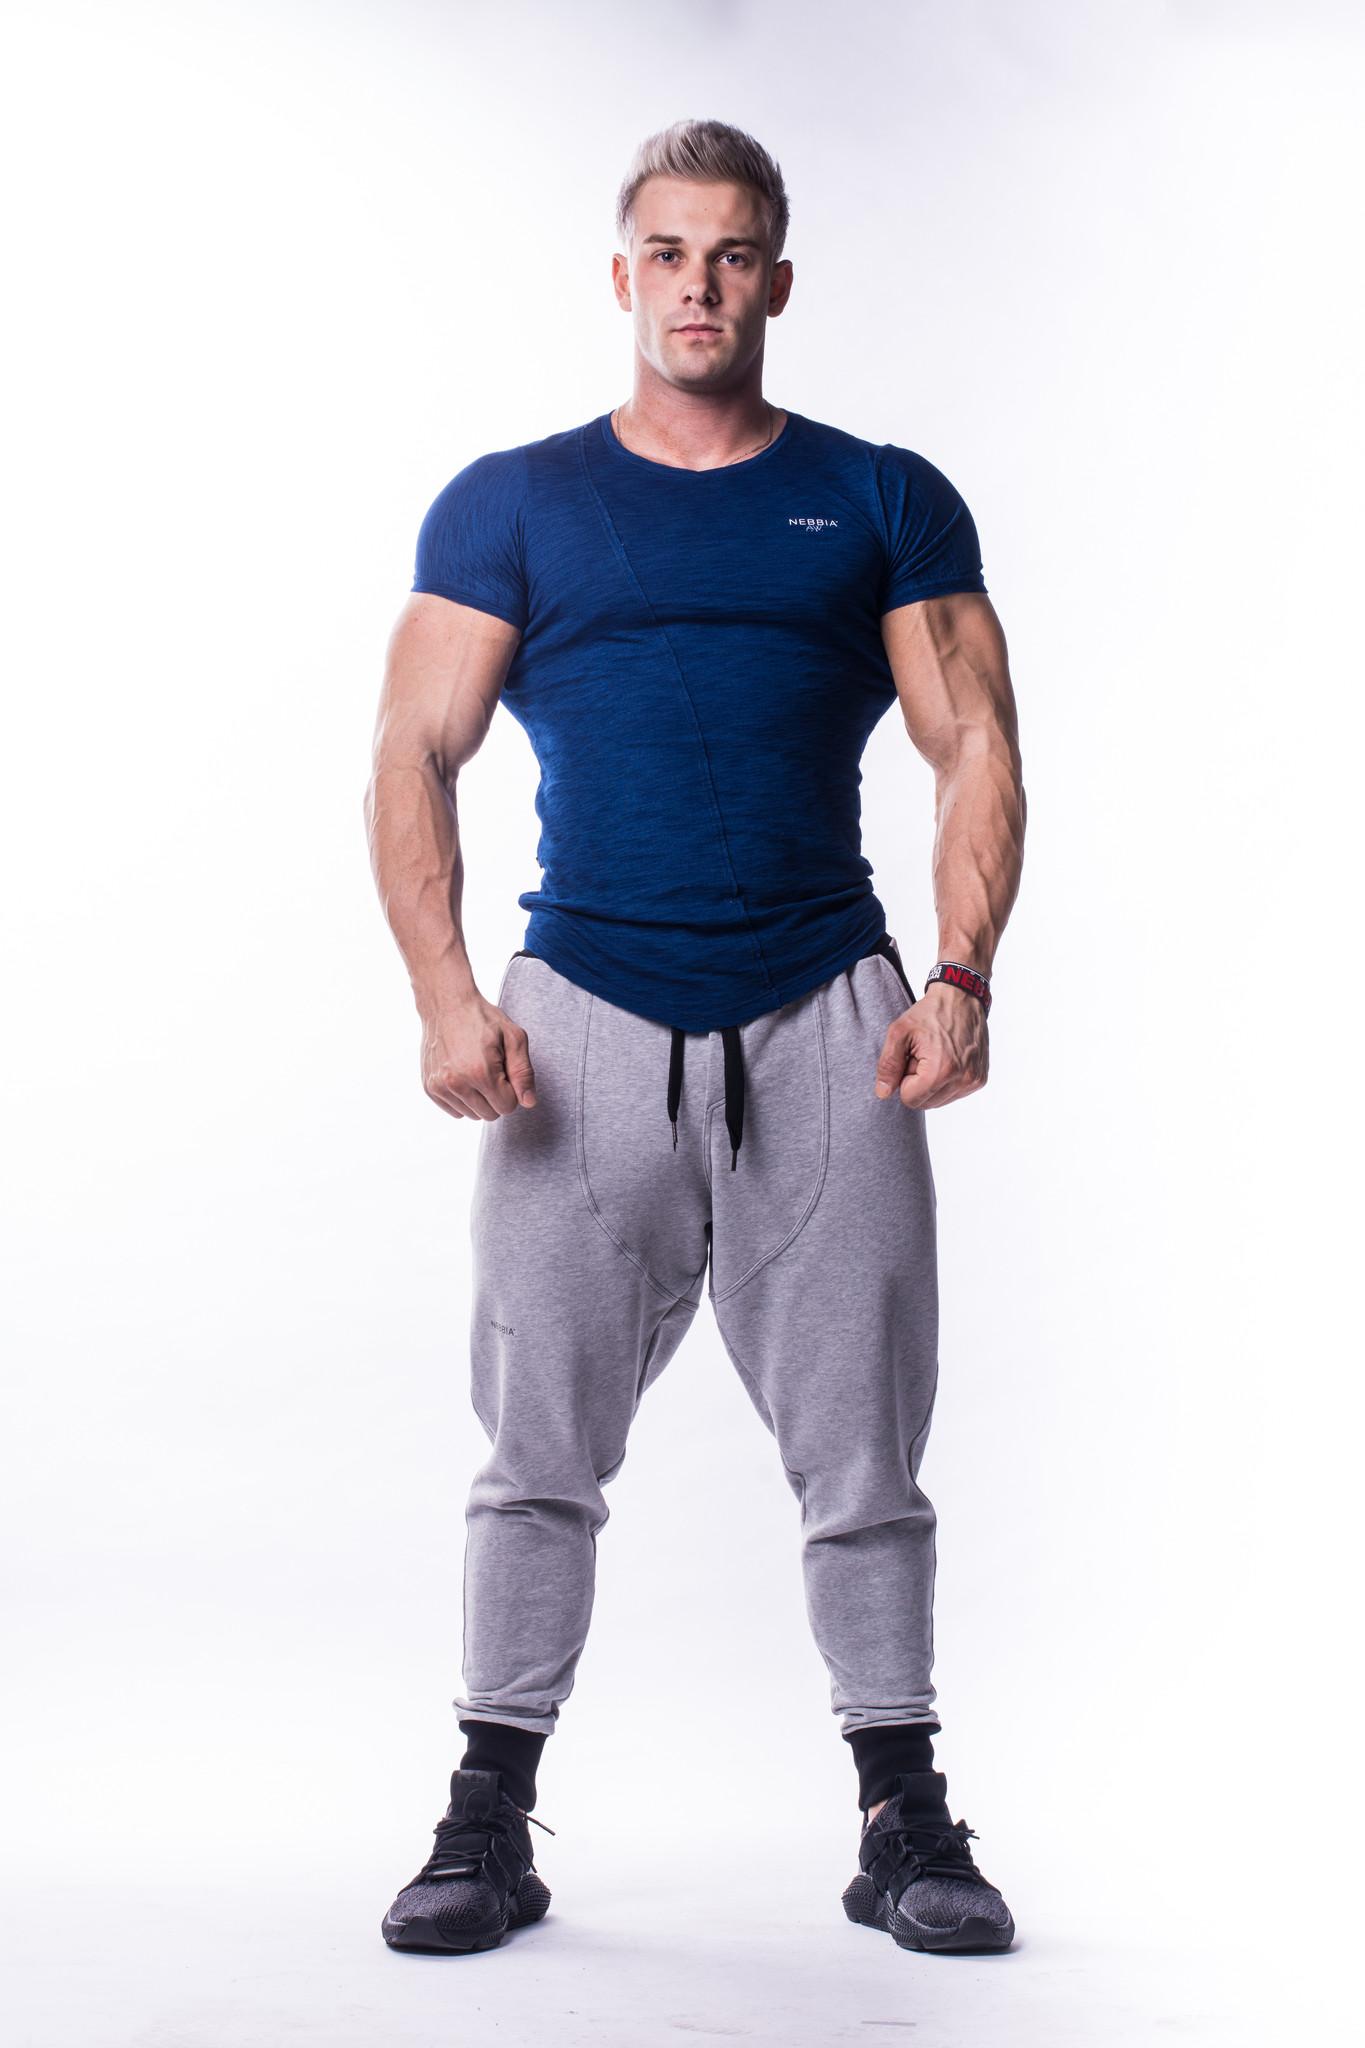 Мужская футболка NB AW Atypical 722 jeans blue